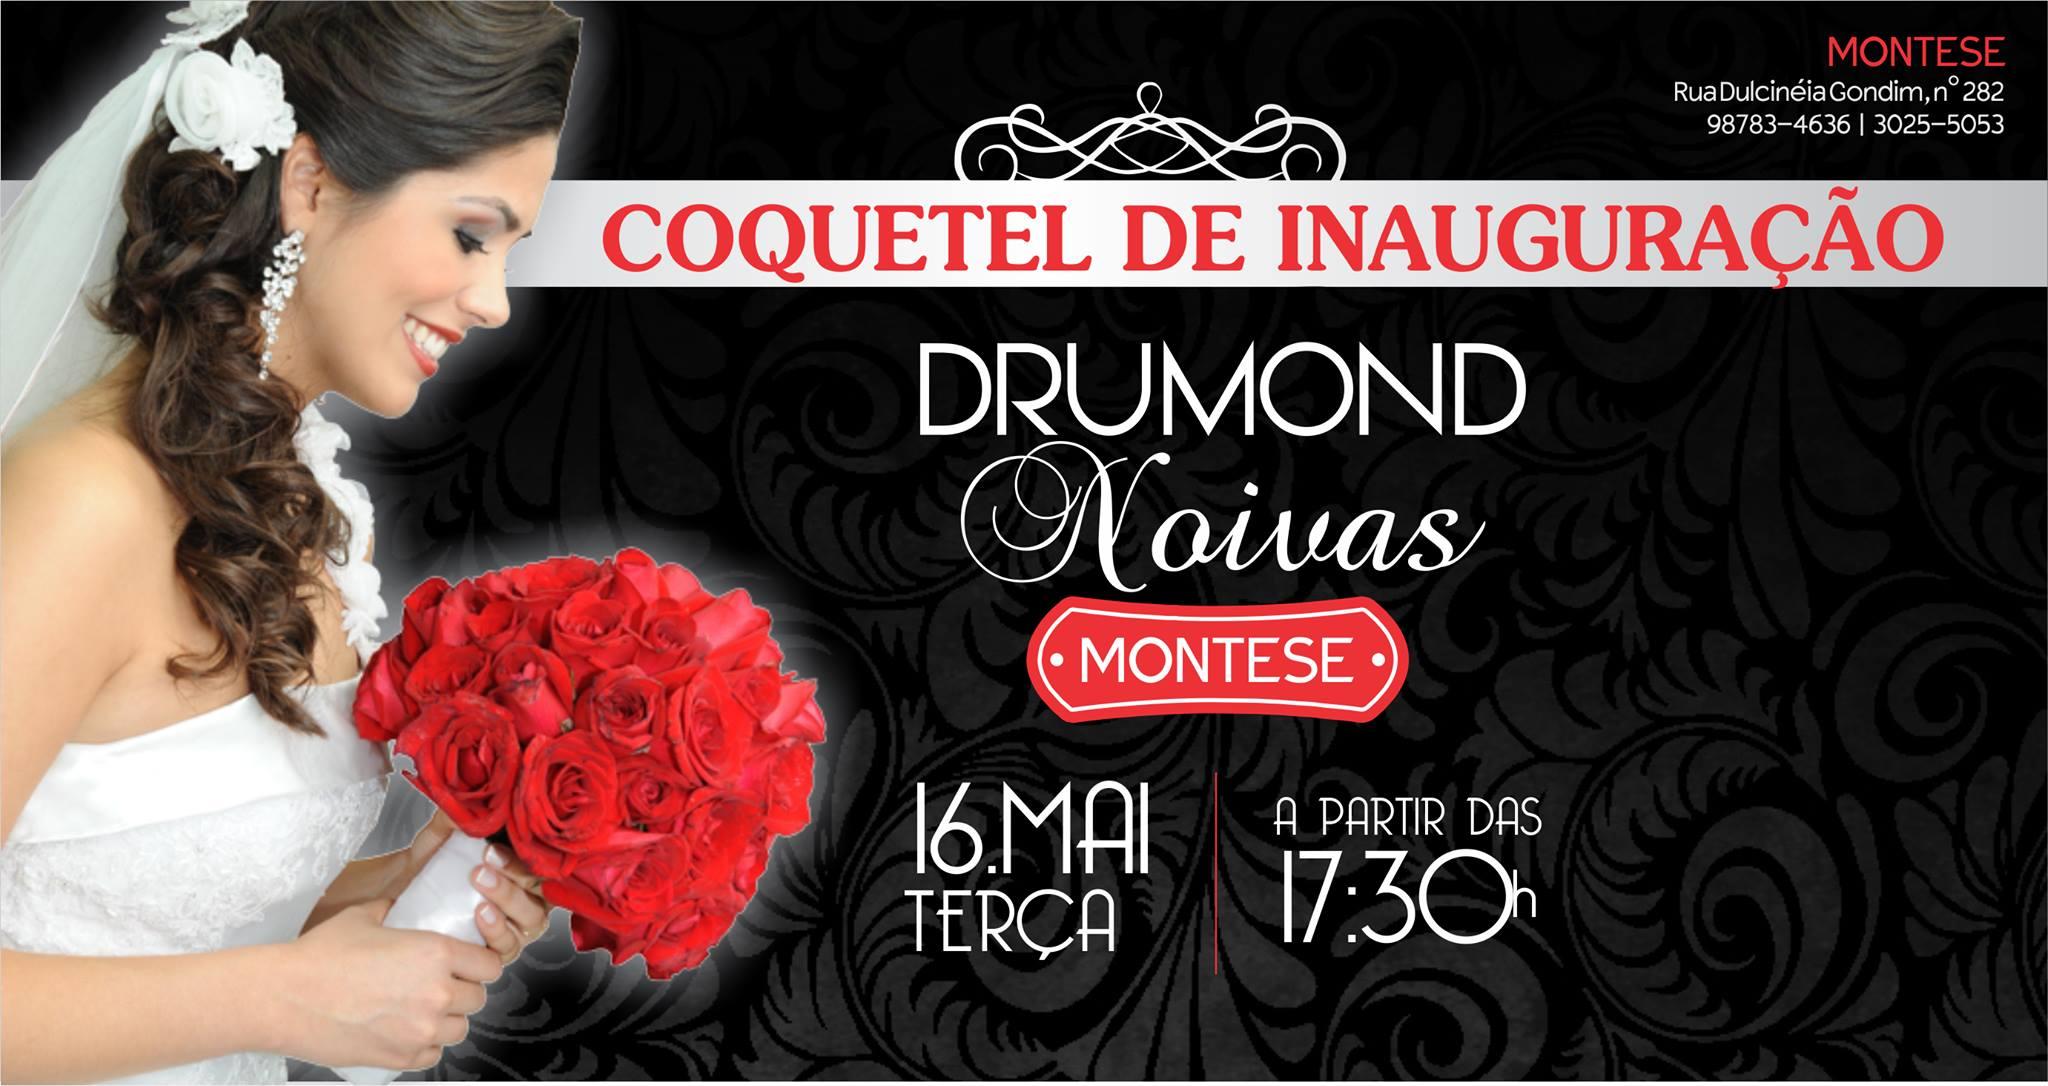 Drumond Noivas Atelier inaugura nova loja no bairro Montese 9e415d4295